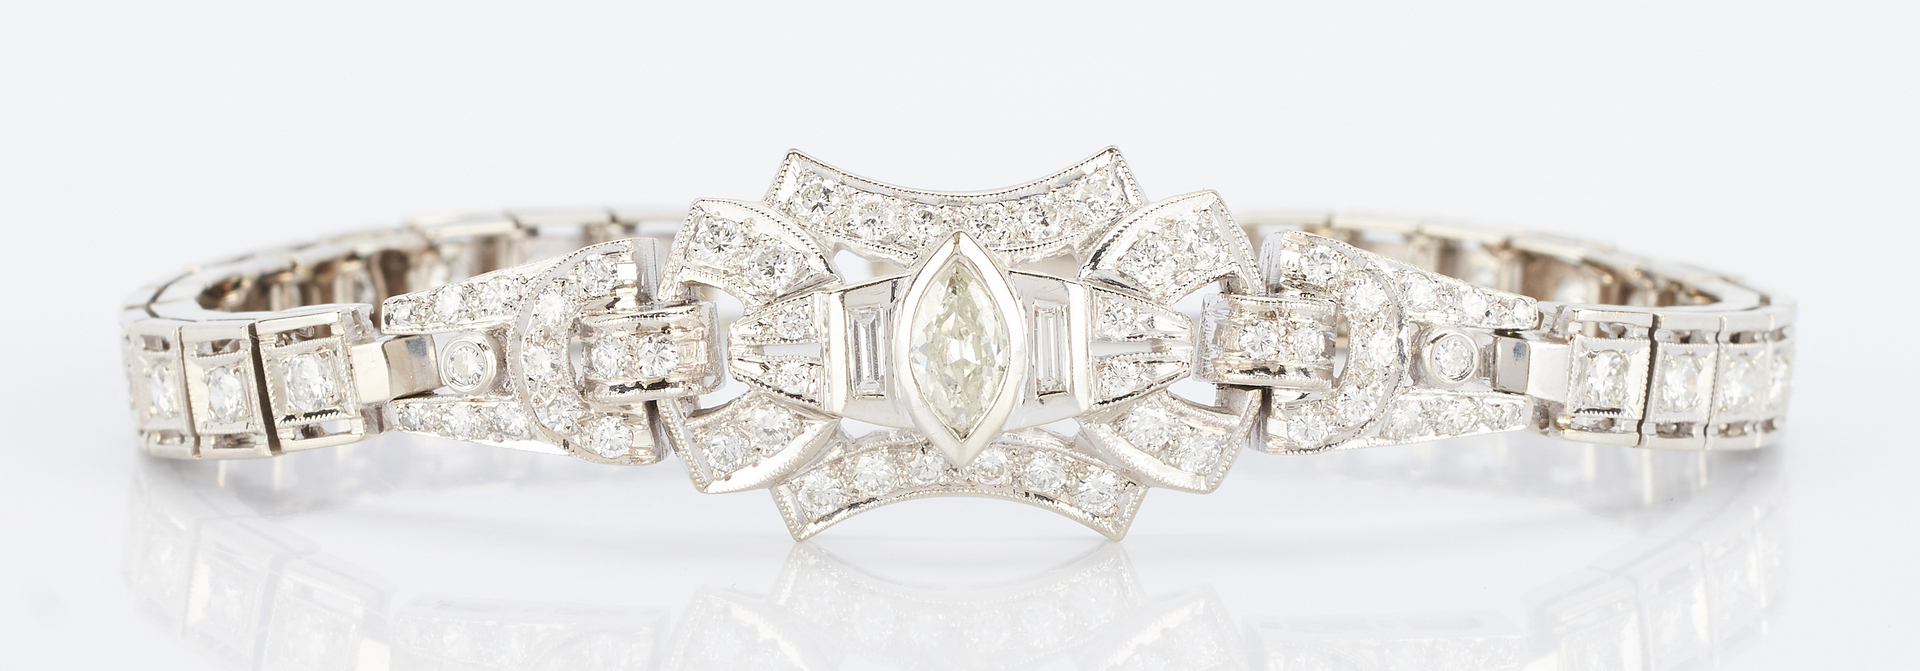 Lot 261: Ladies 14K & Diamond Art Deco Style Bracelet